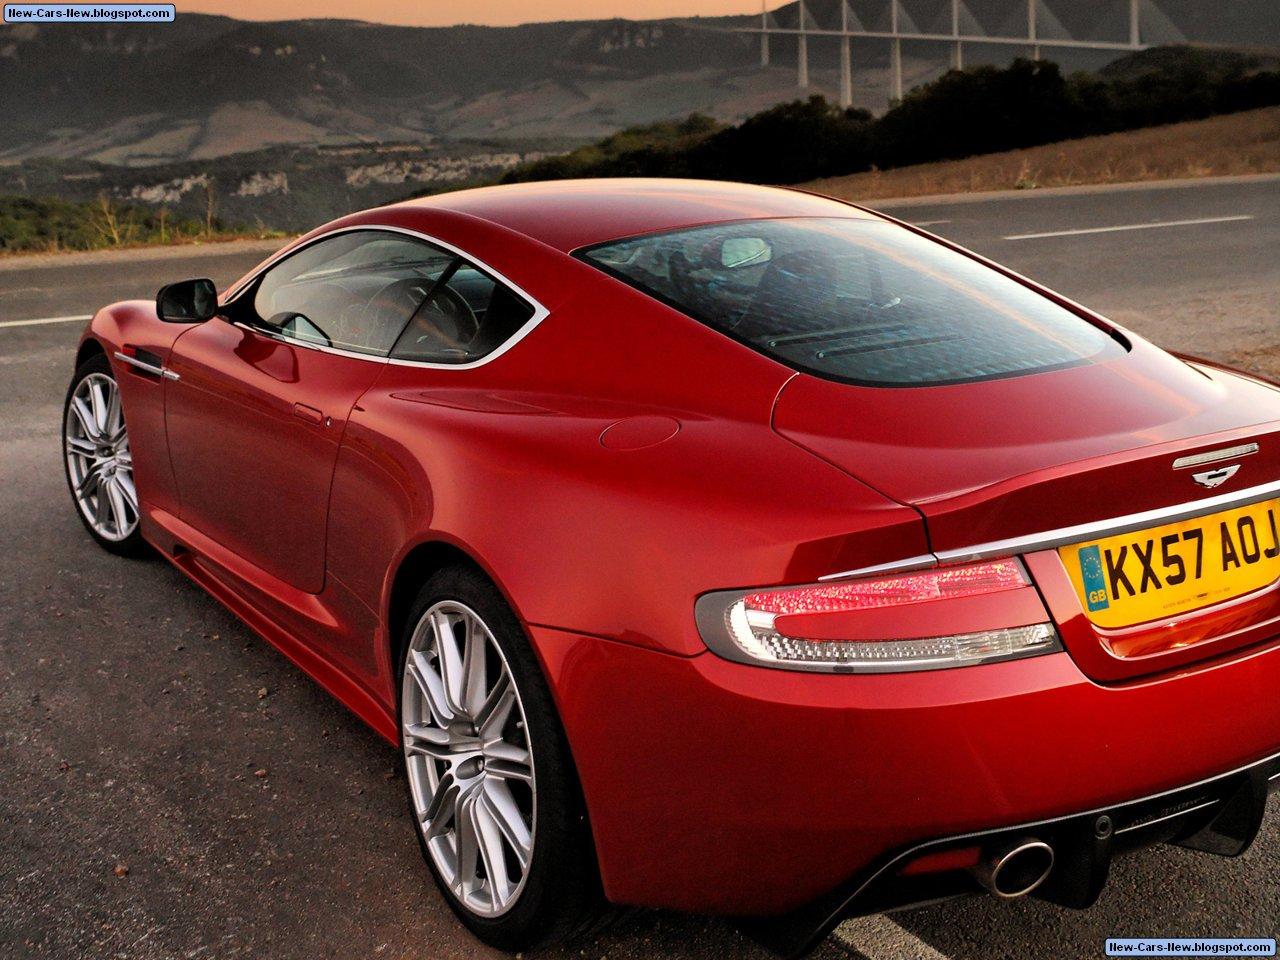 Regal Avalon 12 >> Aston Martin DBS Infa Red (2008)